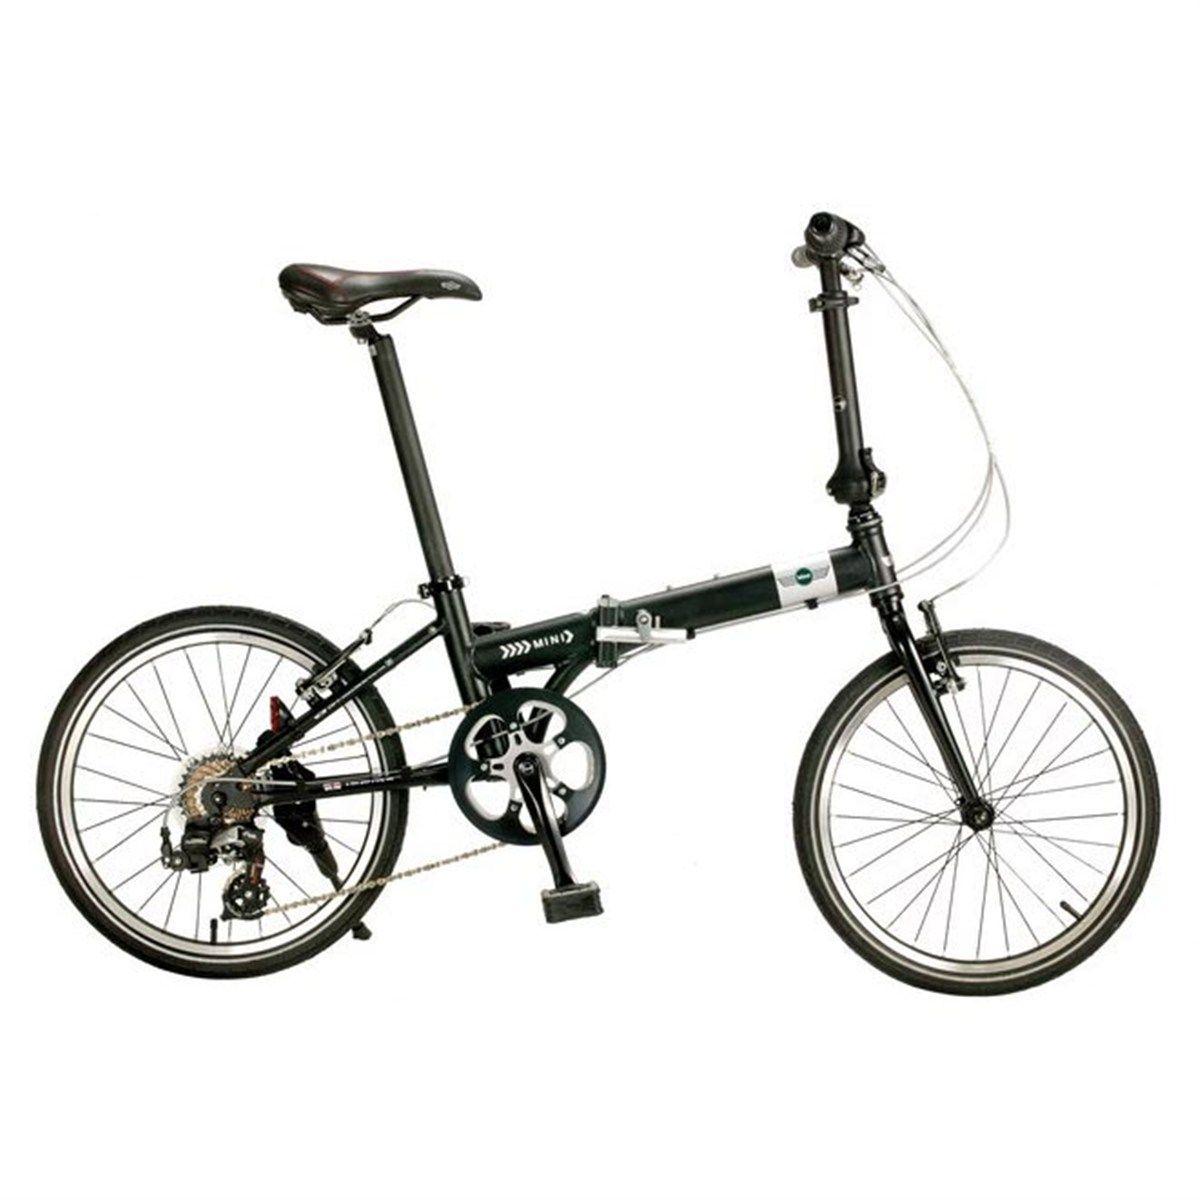 name mini m201 brand mini cooper price hk 5280 additional information size of bike